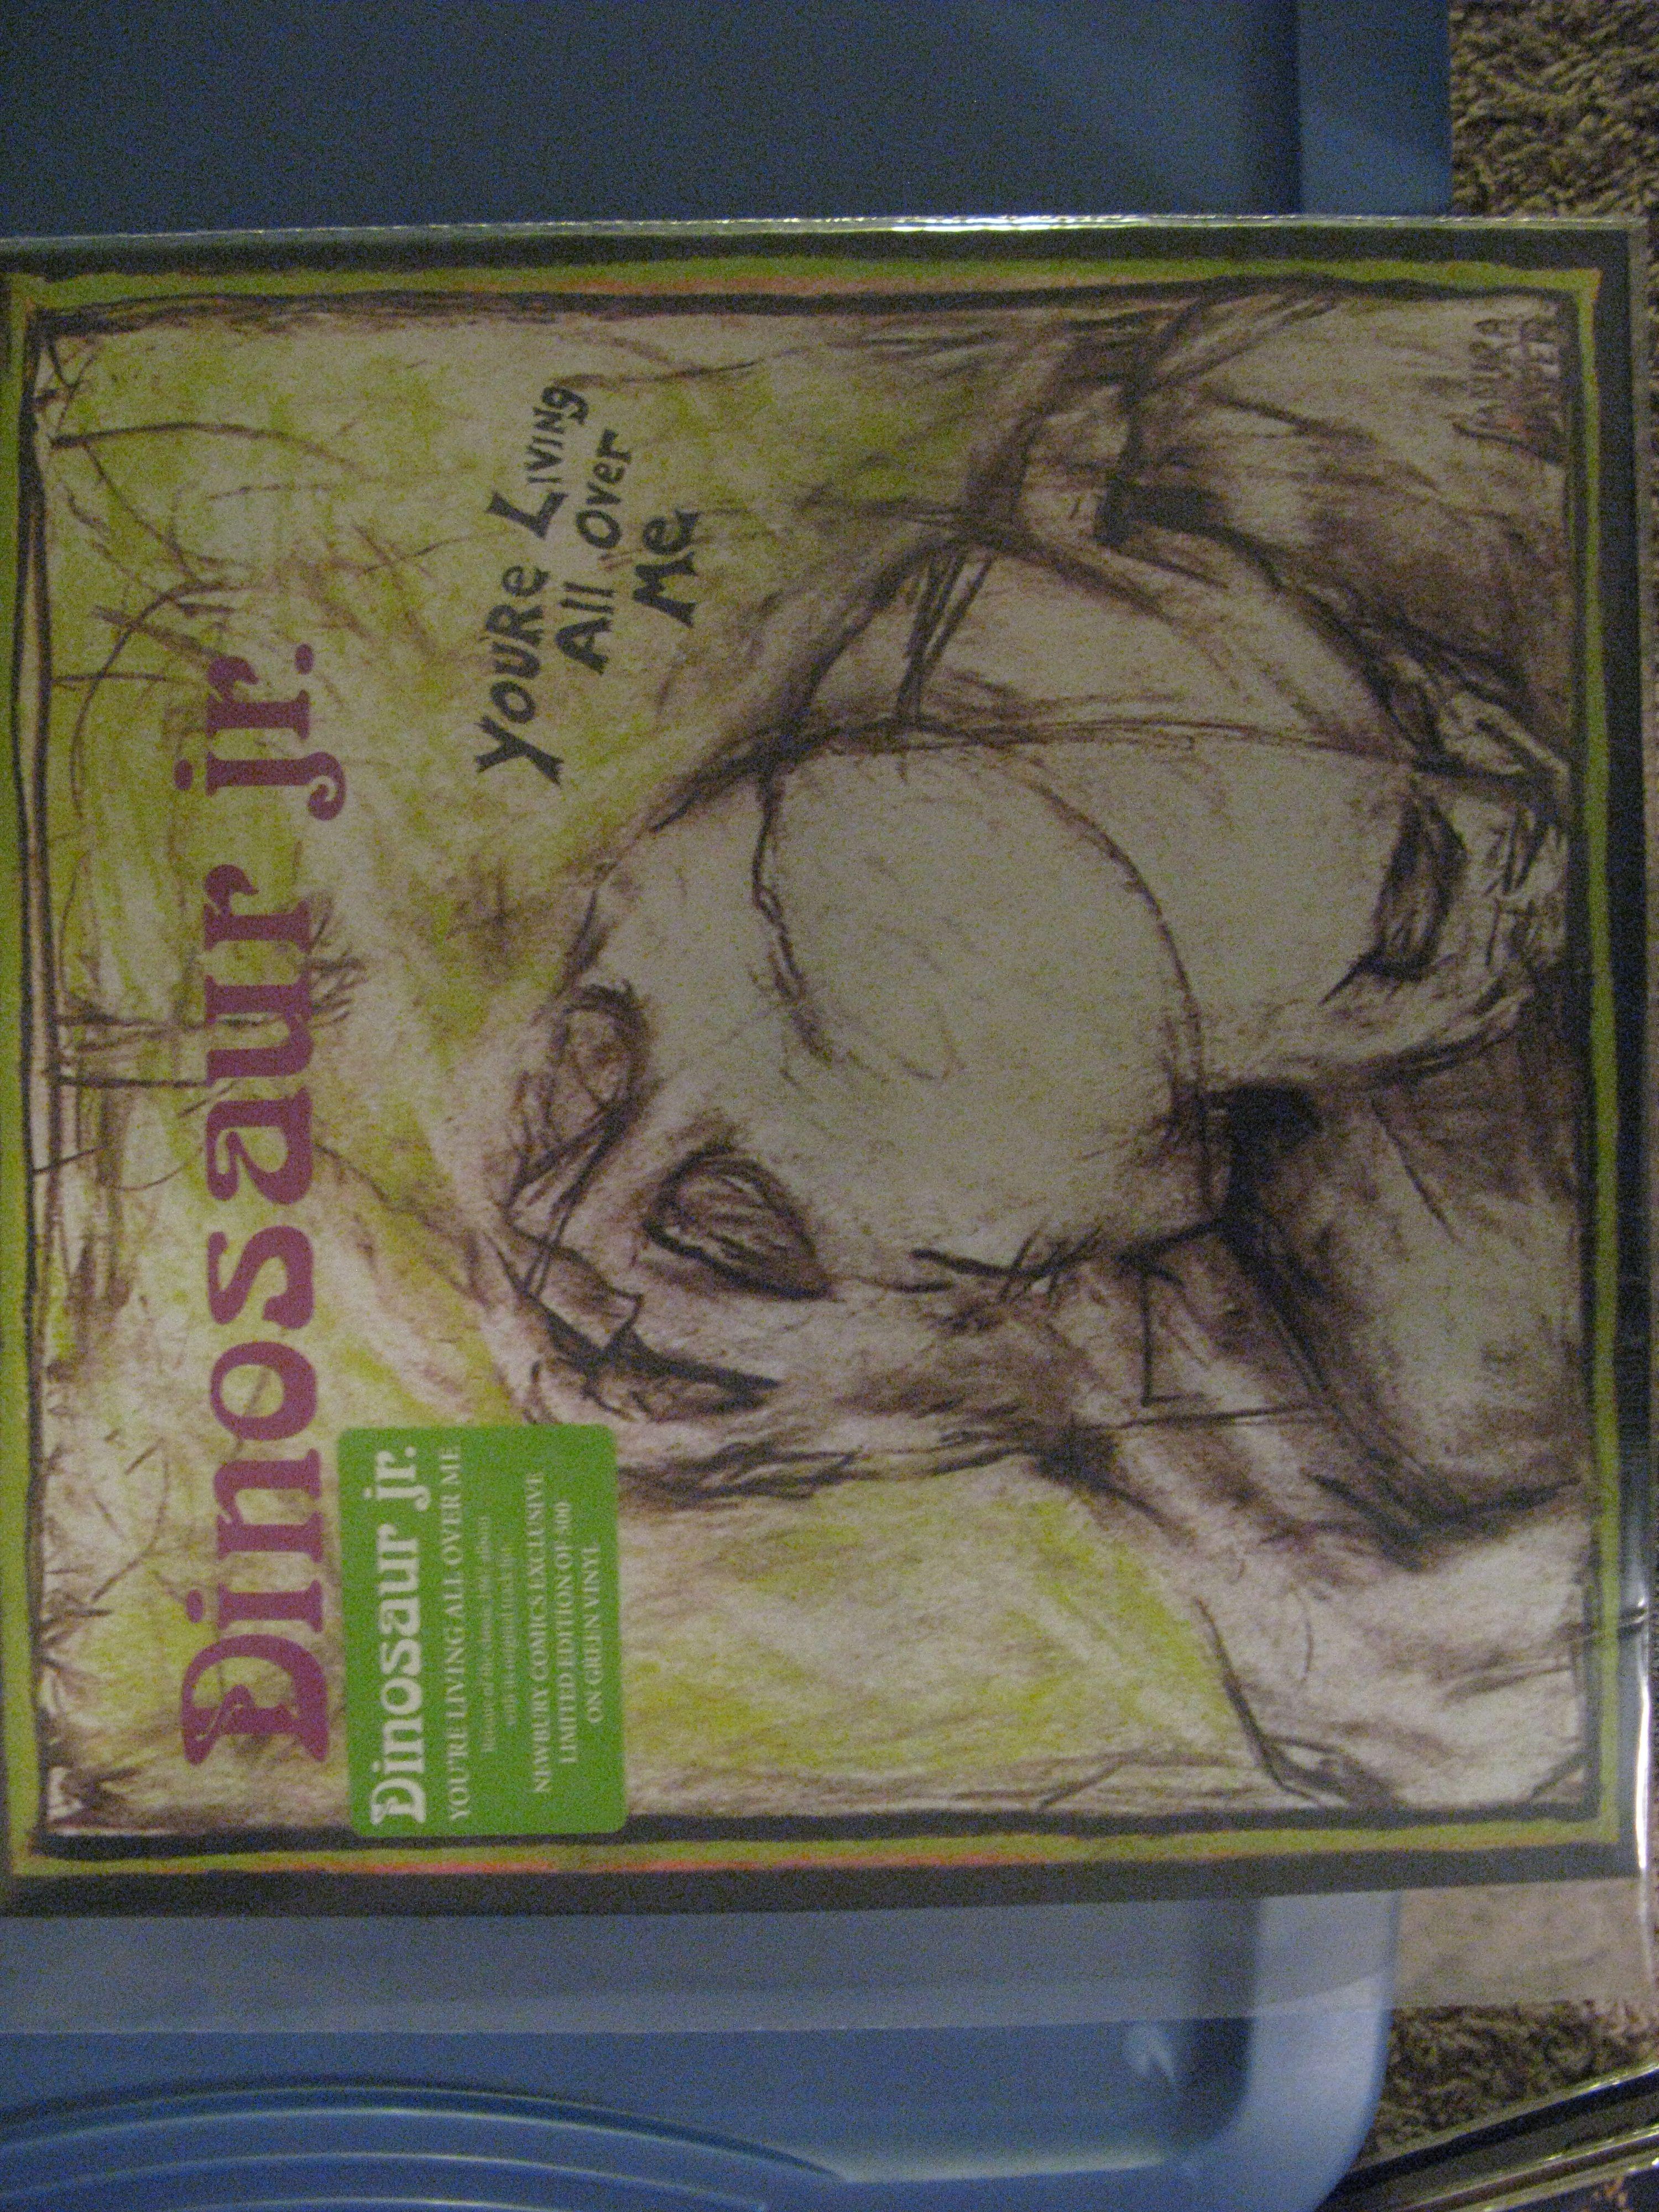 Dinosaur Jr You Re Living All Over Me Newbury Comics Colored Vinyl Vinyl Record Collection Dinosaur Jr Newbury Comics